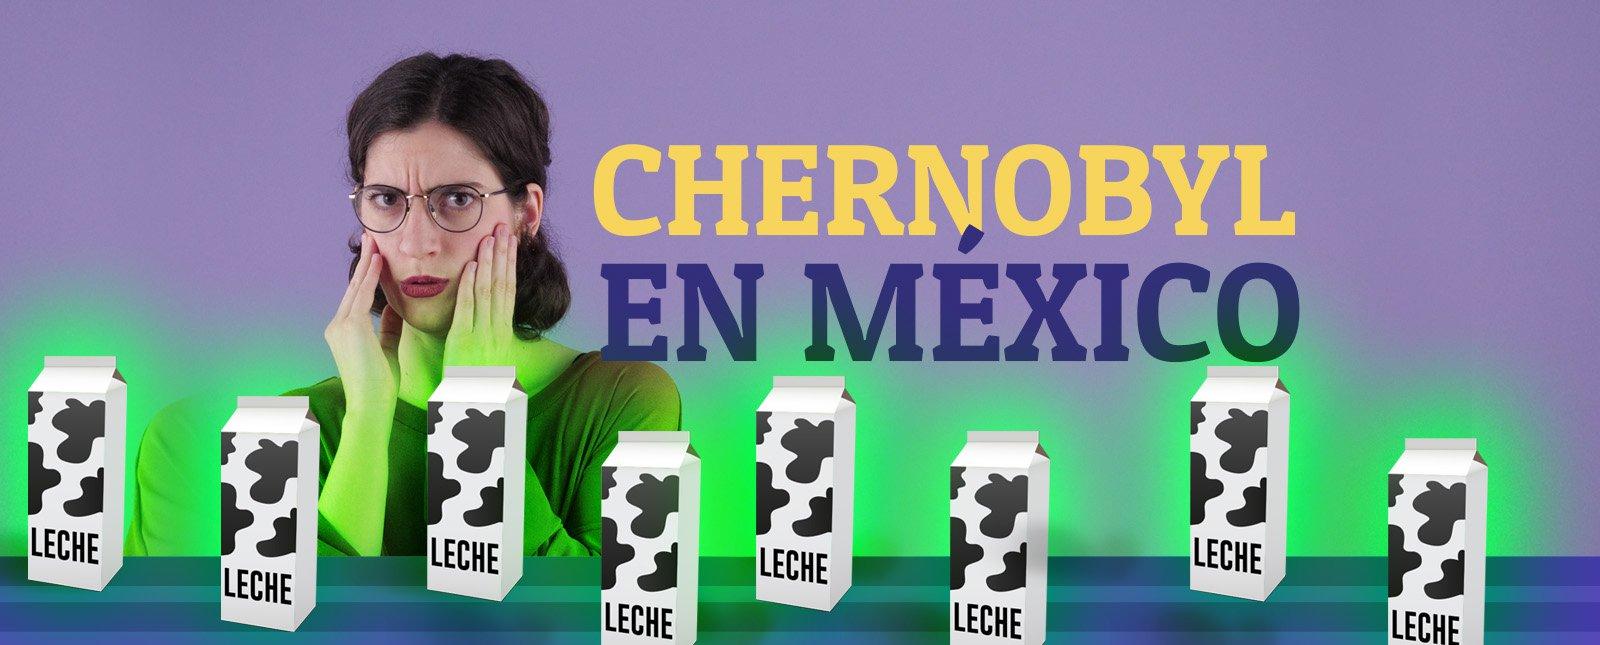 ¿México compró leche radioactiva?